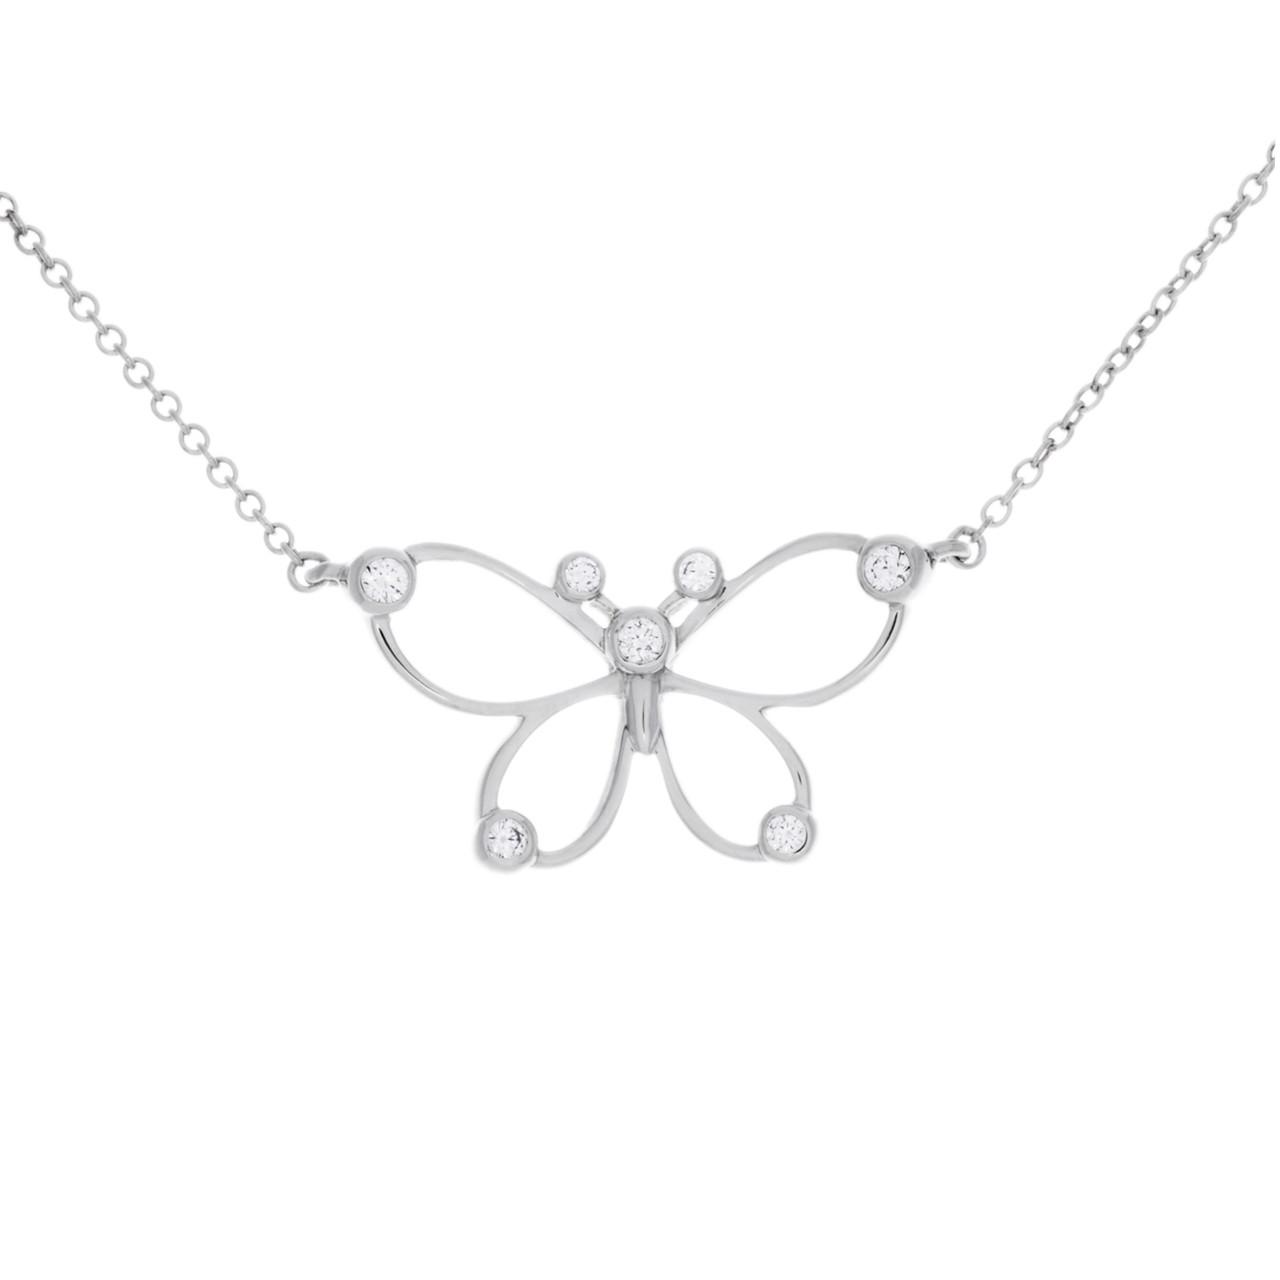 473bdf293 Tiffany & Co. Sterling Silver & Diamond Butterfly Necklace - modaselle